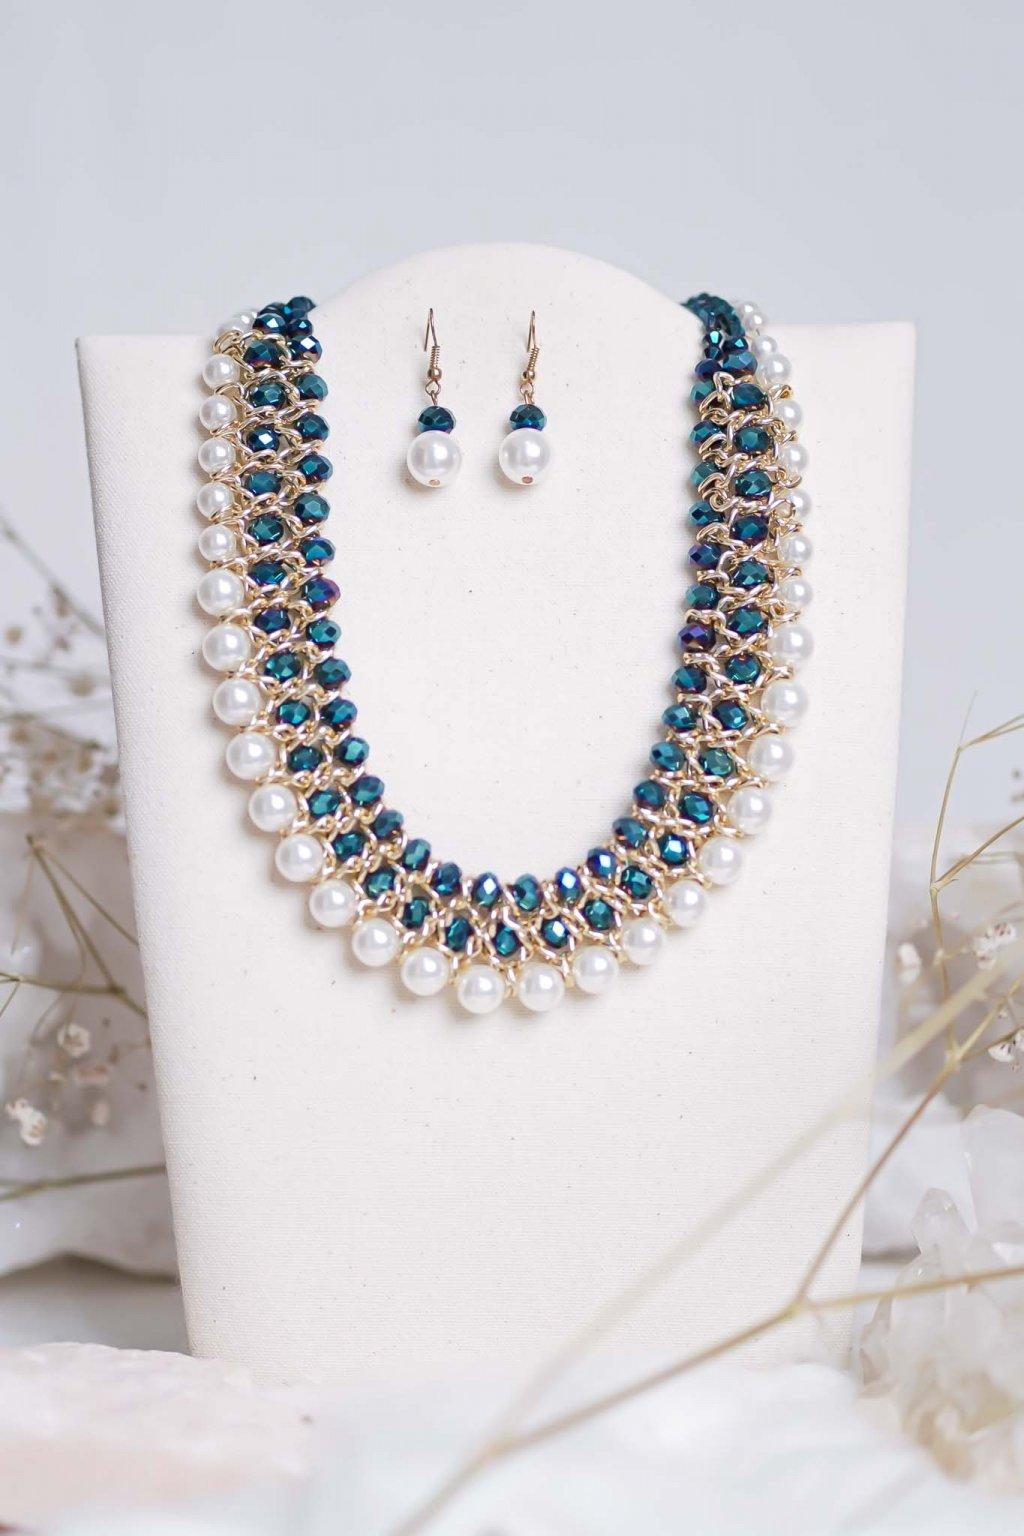 náhrdelník, šperk, spoločenská náhrdelník, náhrdelník na bežný deň, výrazný náhrdelník, jemný náhrdelník, šperky, náhrdelník na ples, svadbu, stužkovú 39